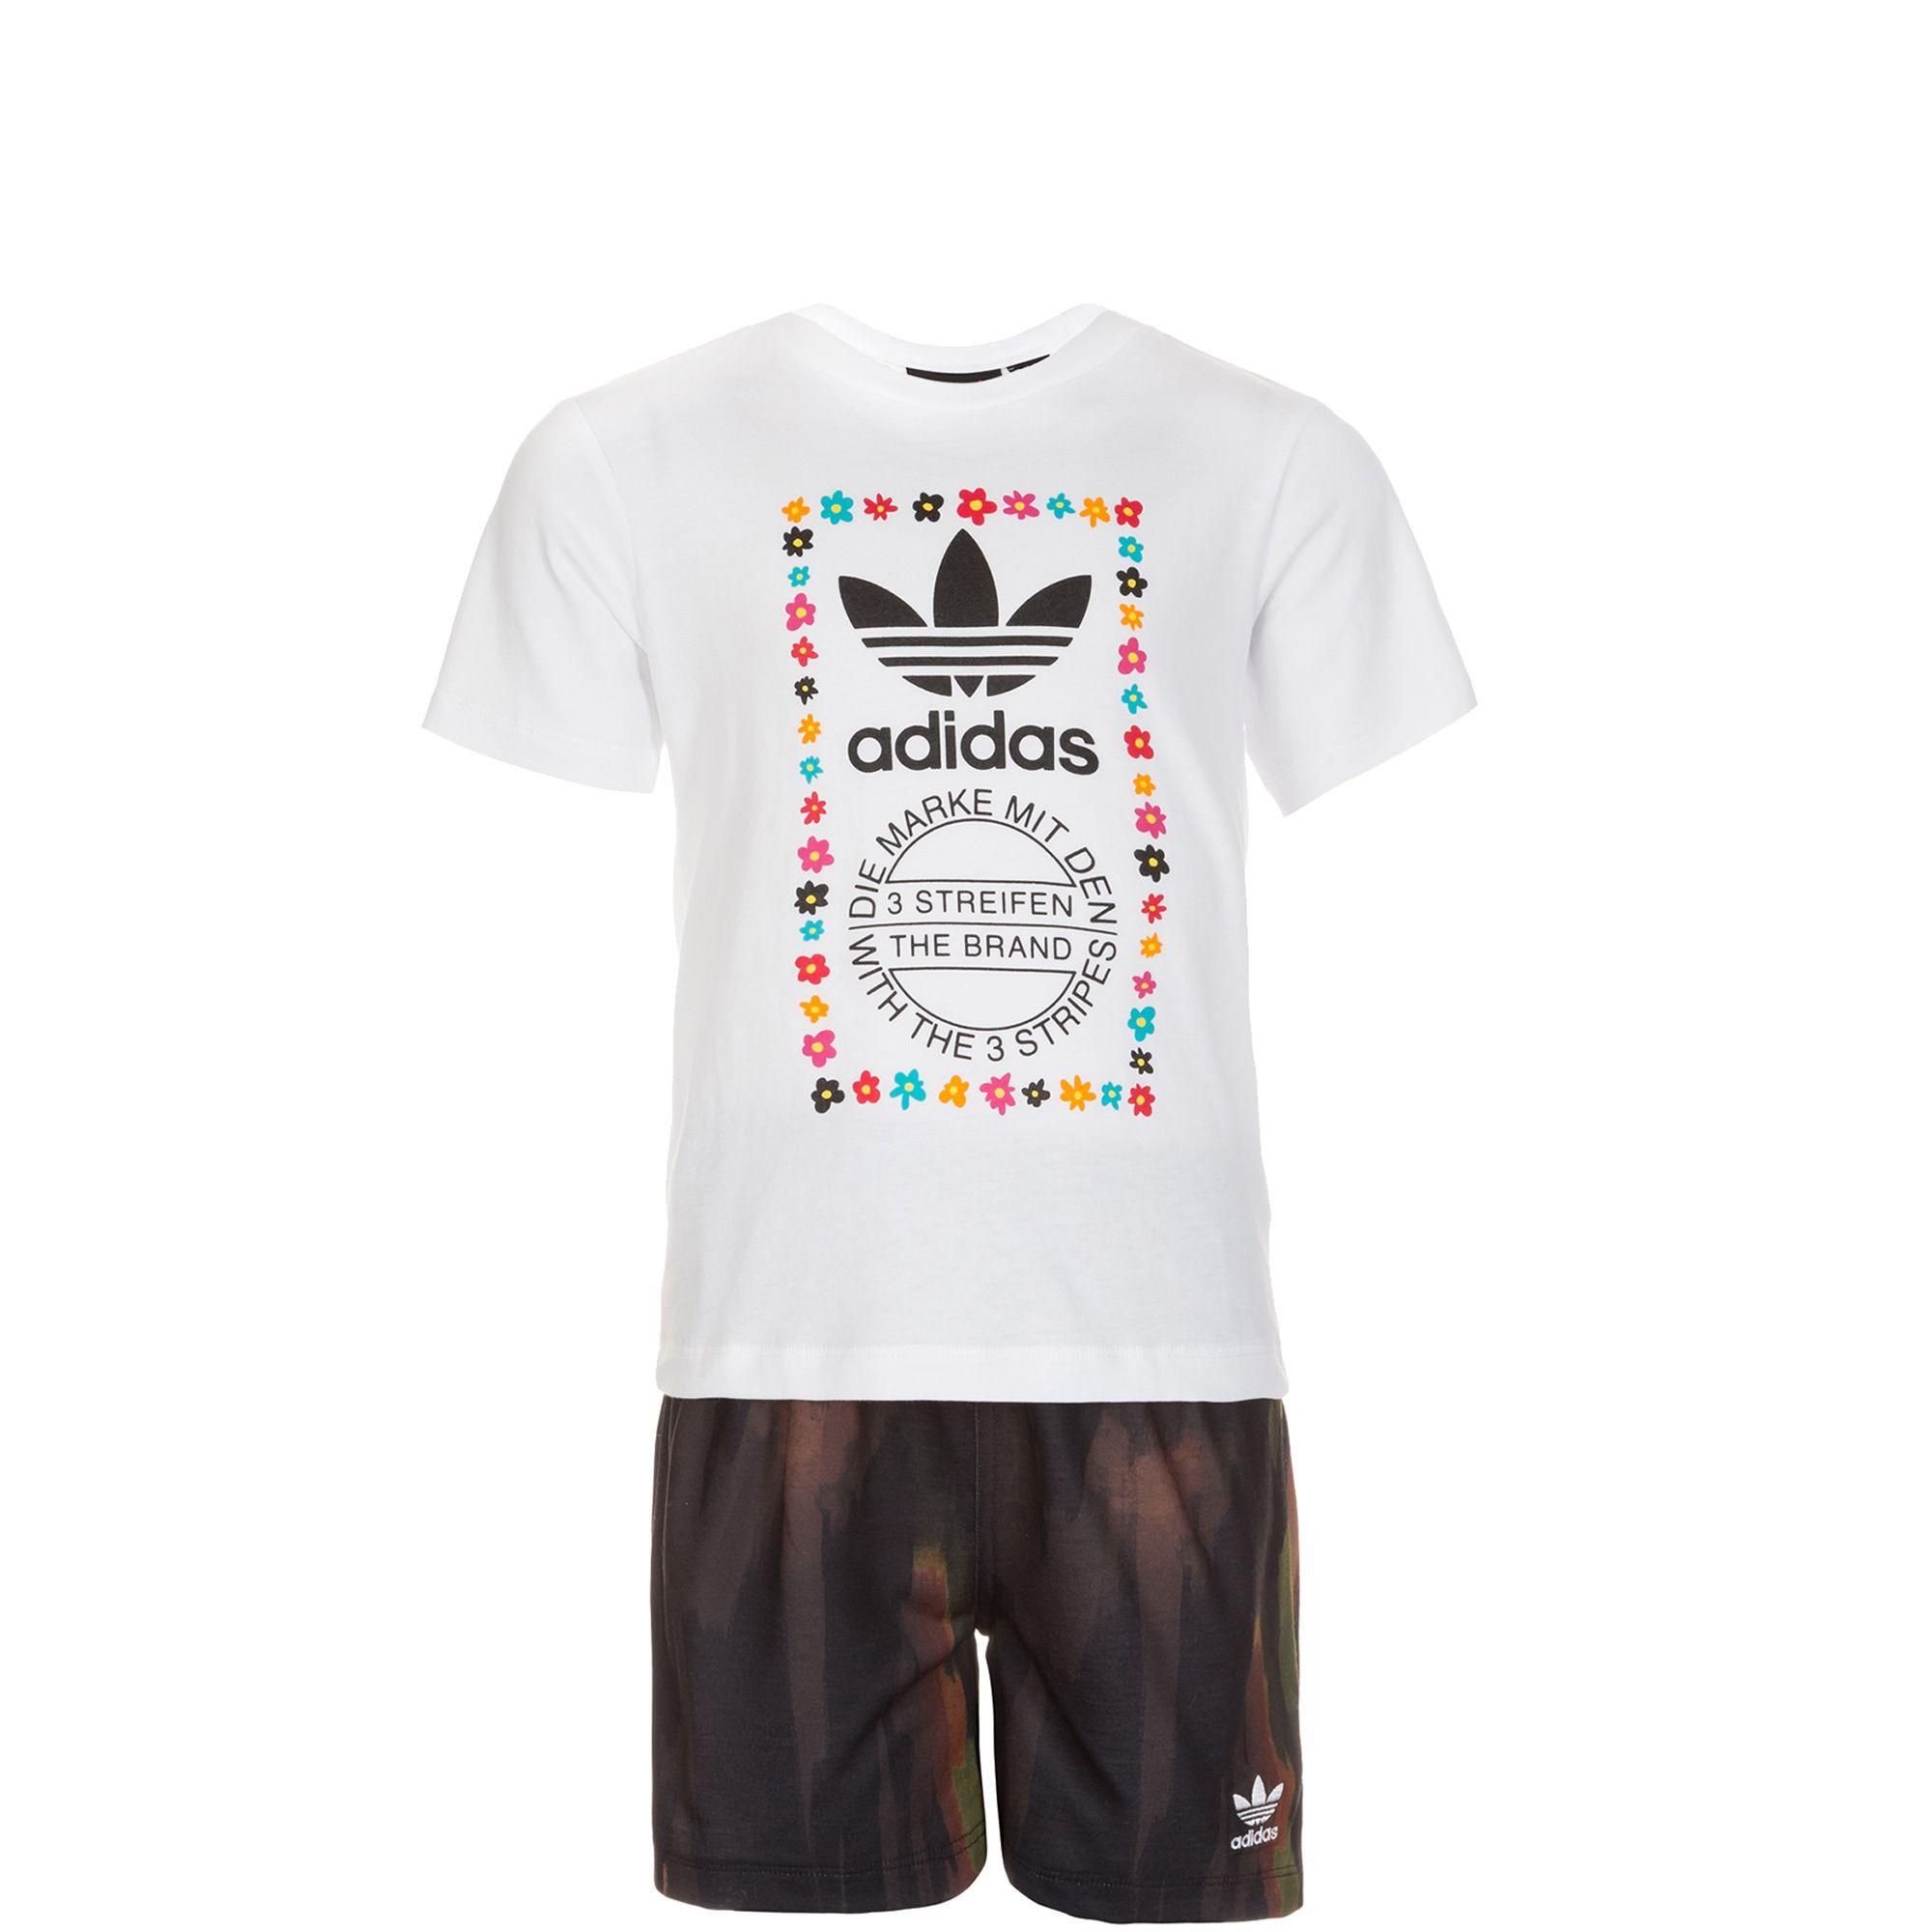 ADIDAS ORIGINALS adidas Originals Set: I Pharrell Set Kleinkinder